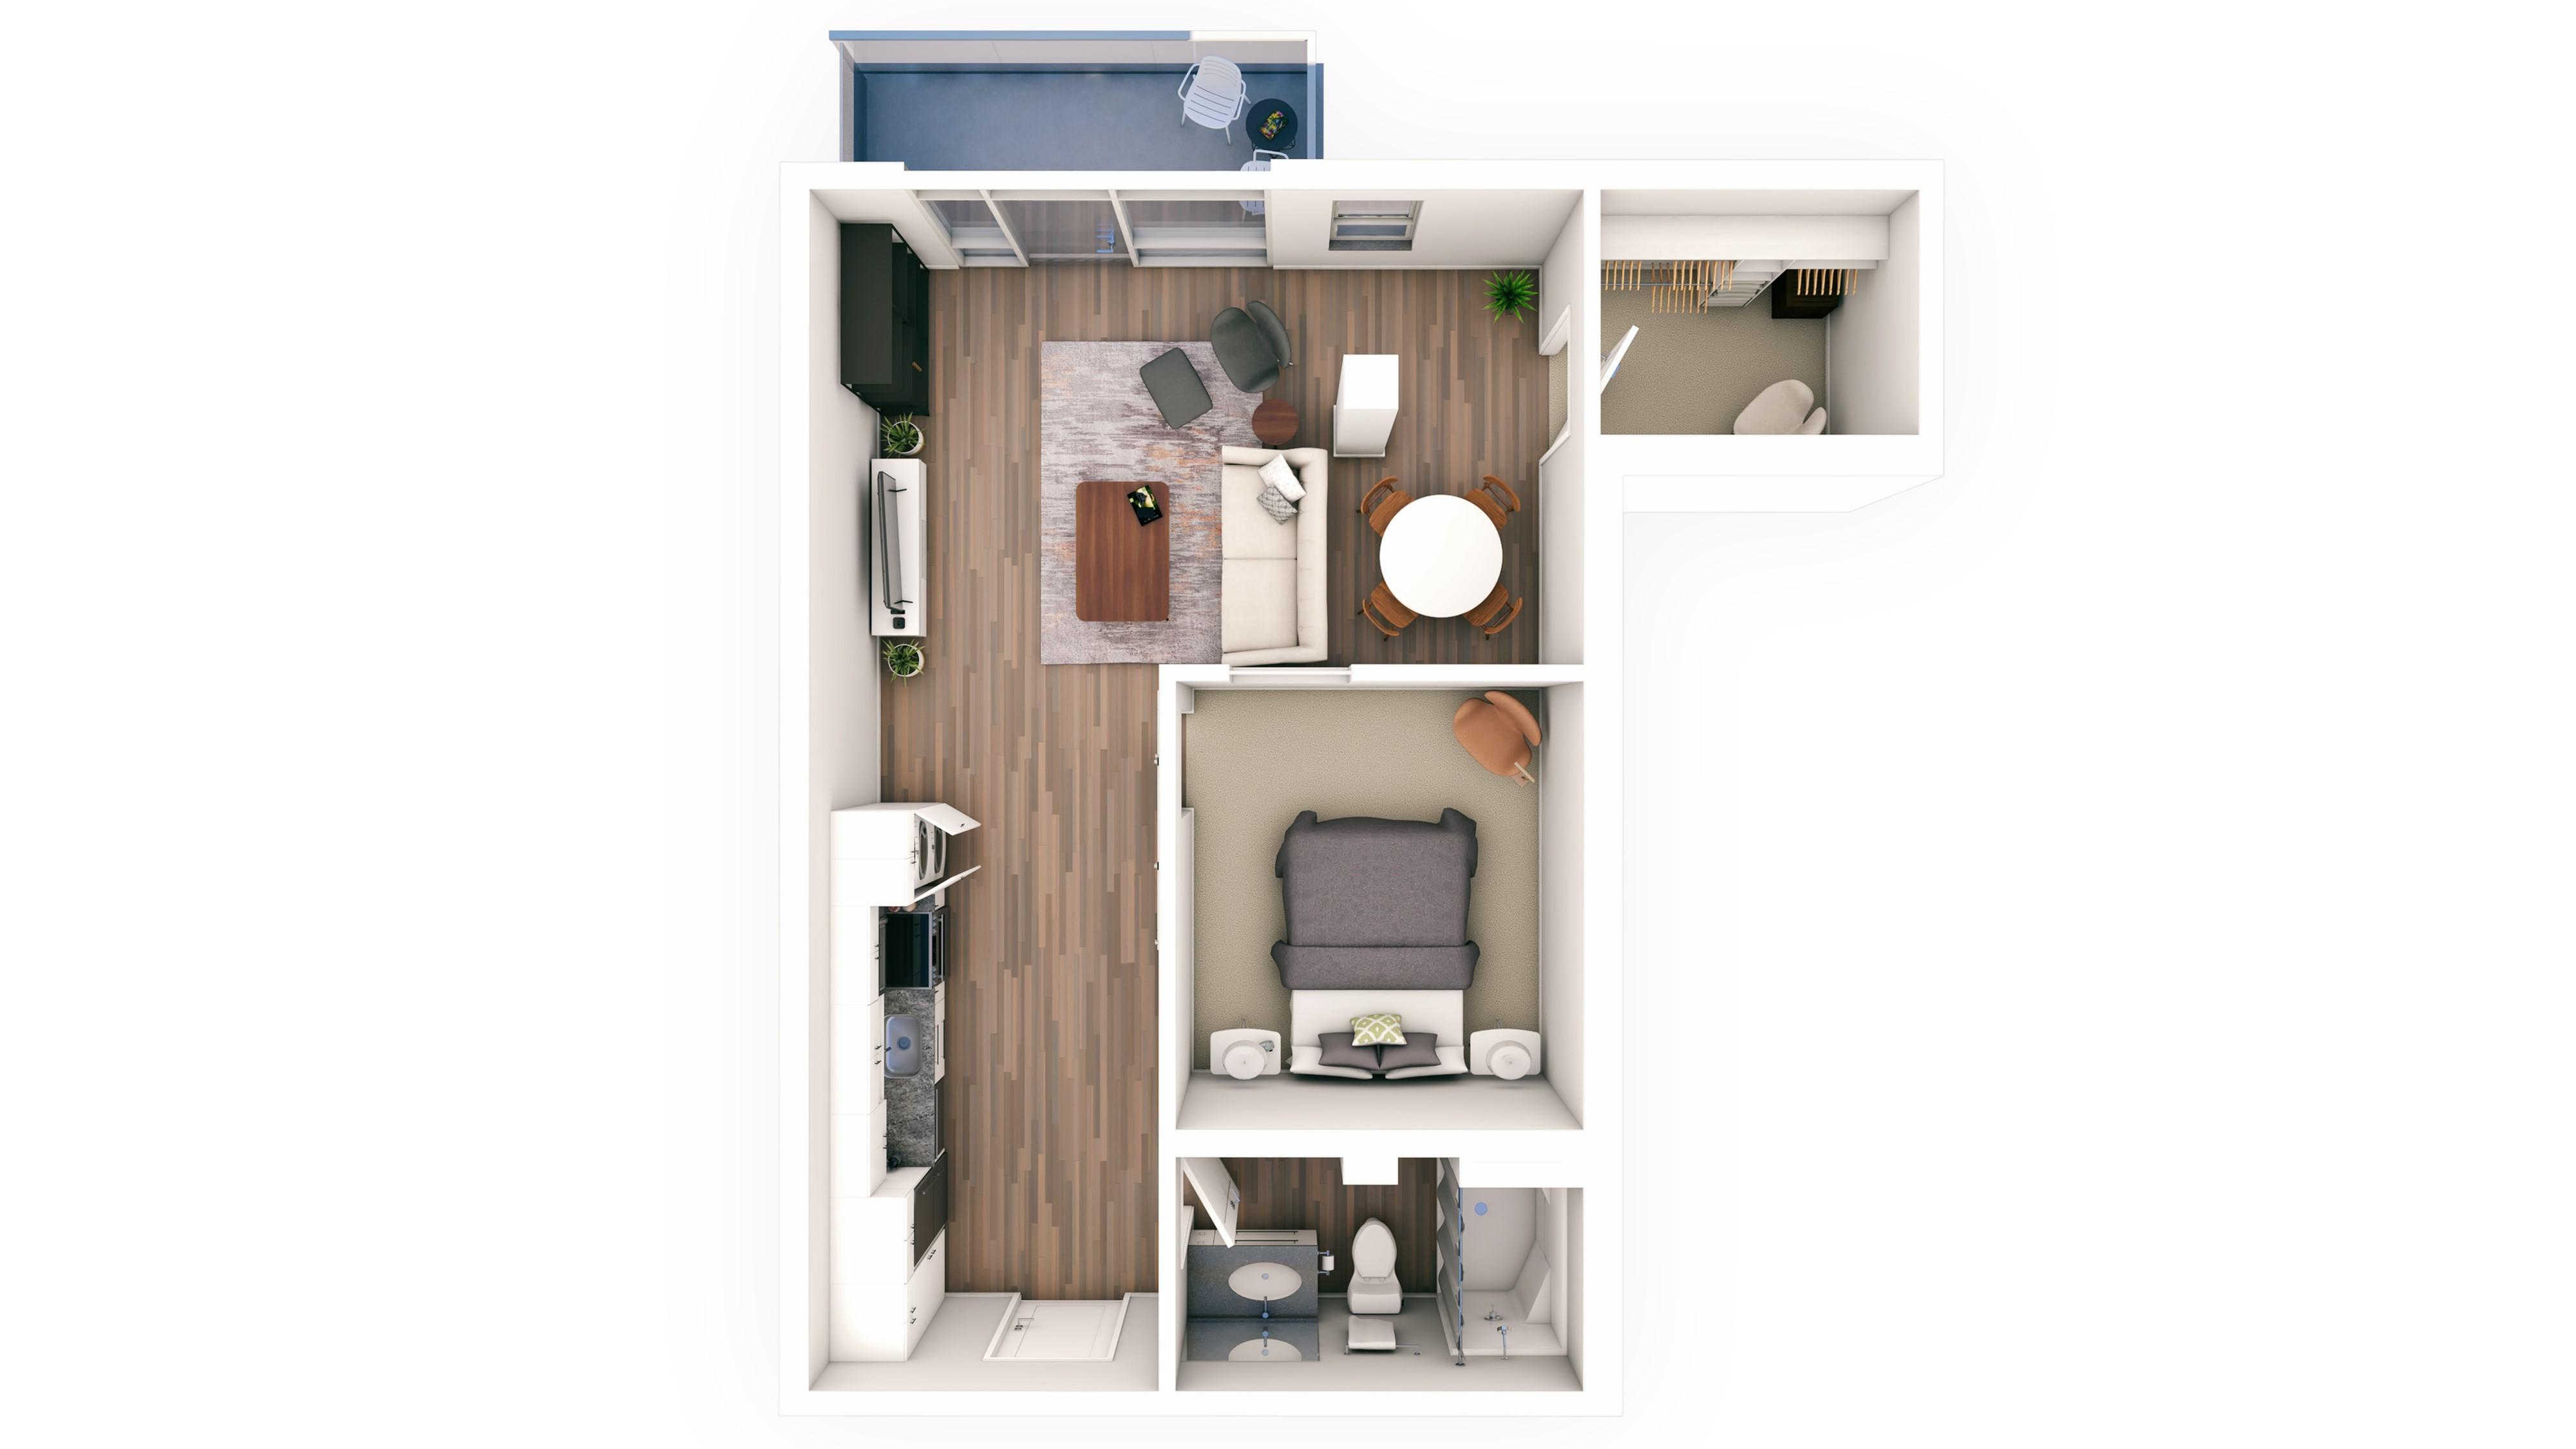 Urbanite 1BR 12 | Urbanite | Milwaukee Apartments